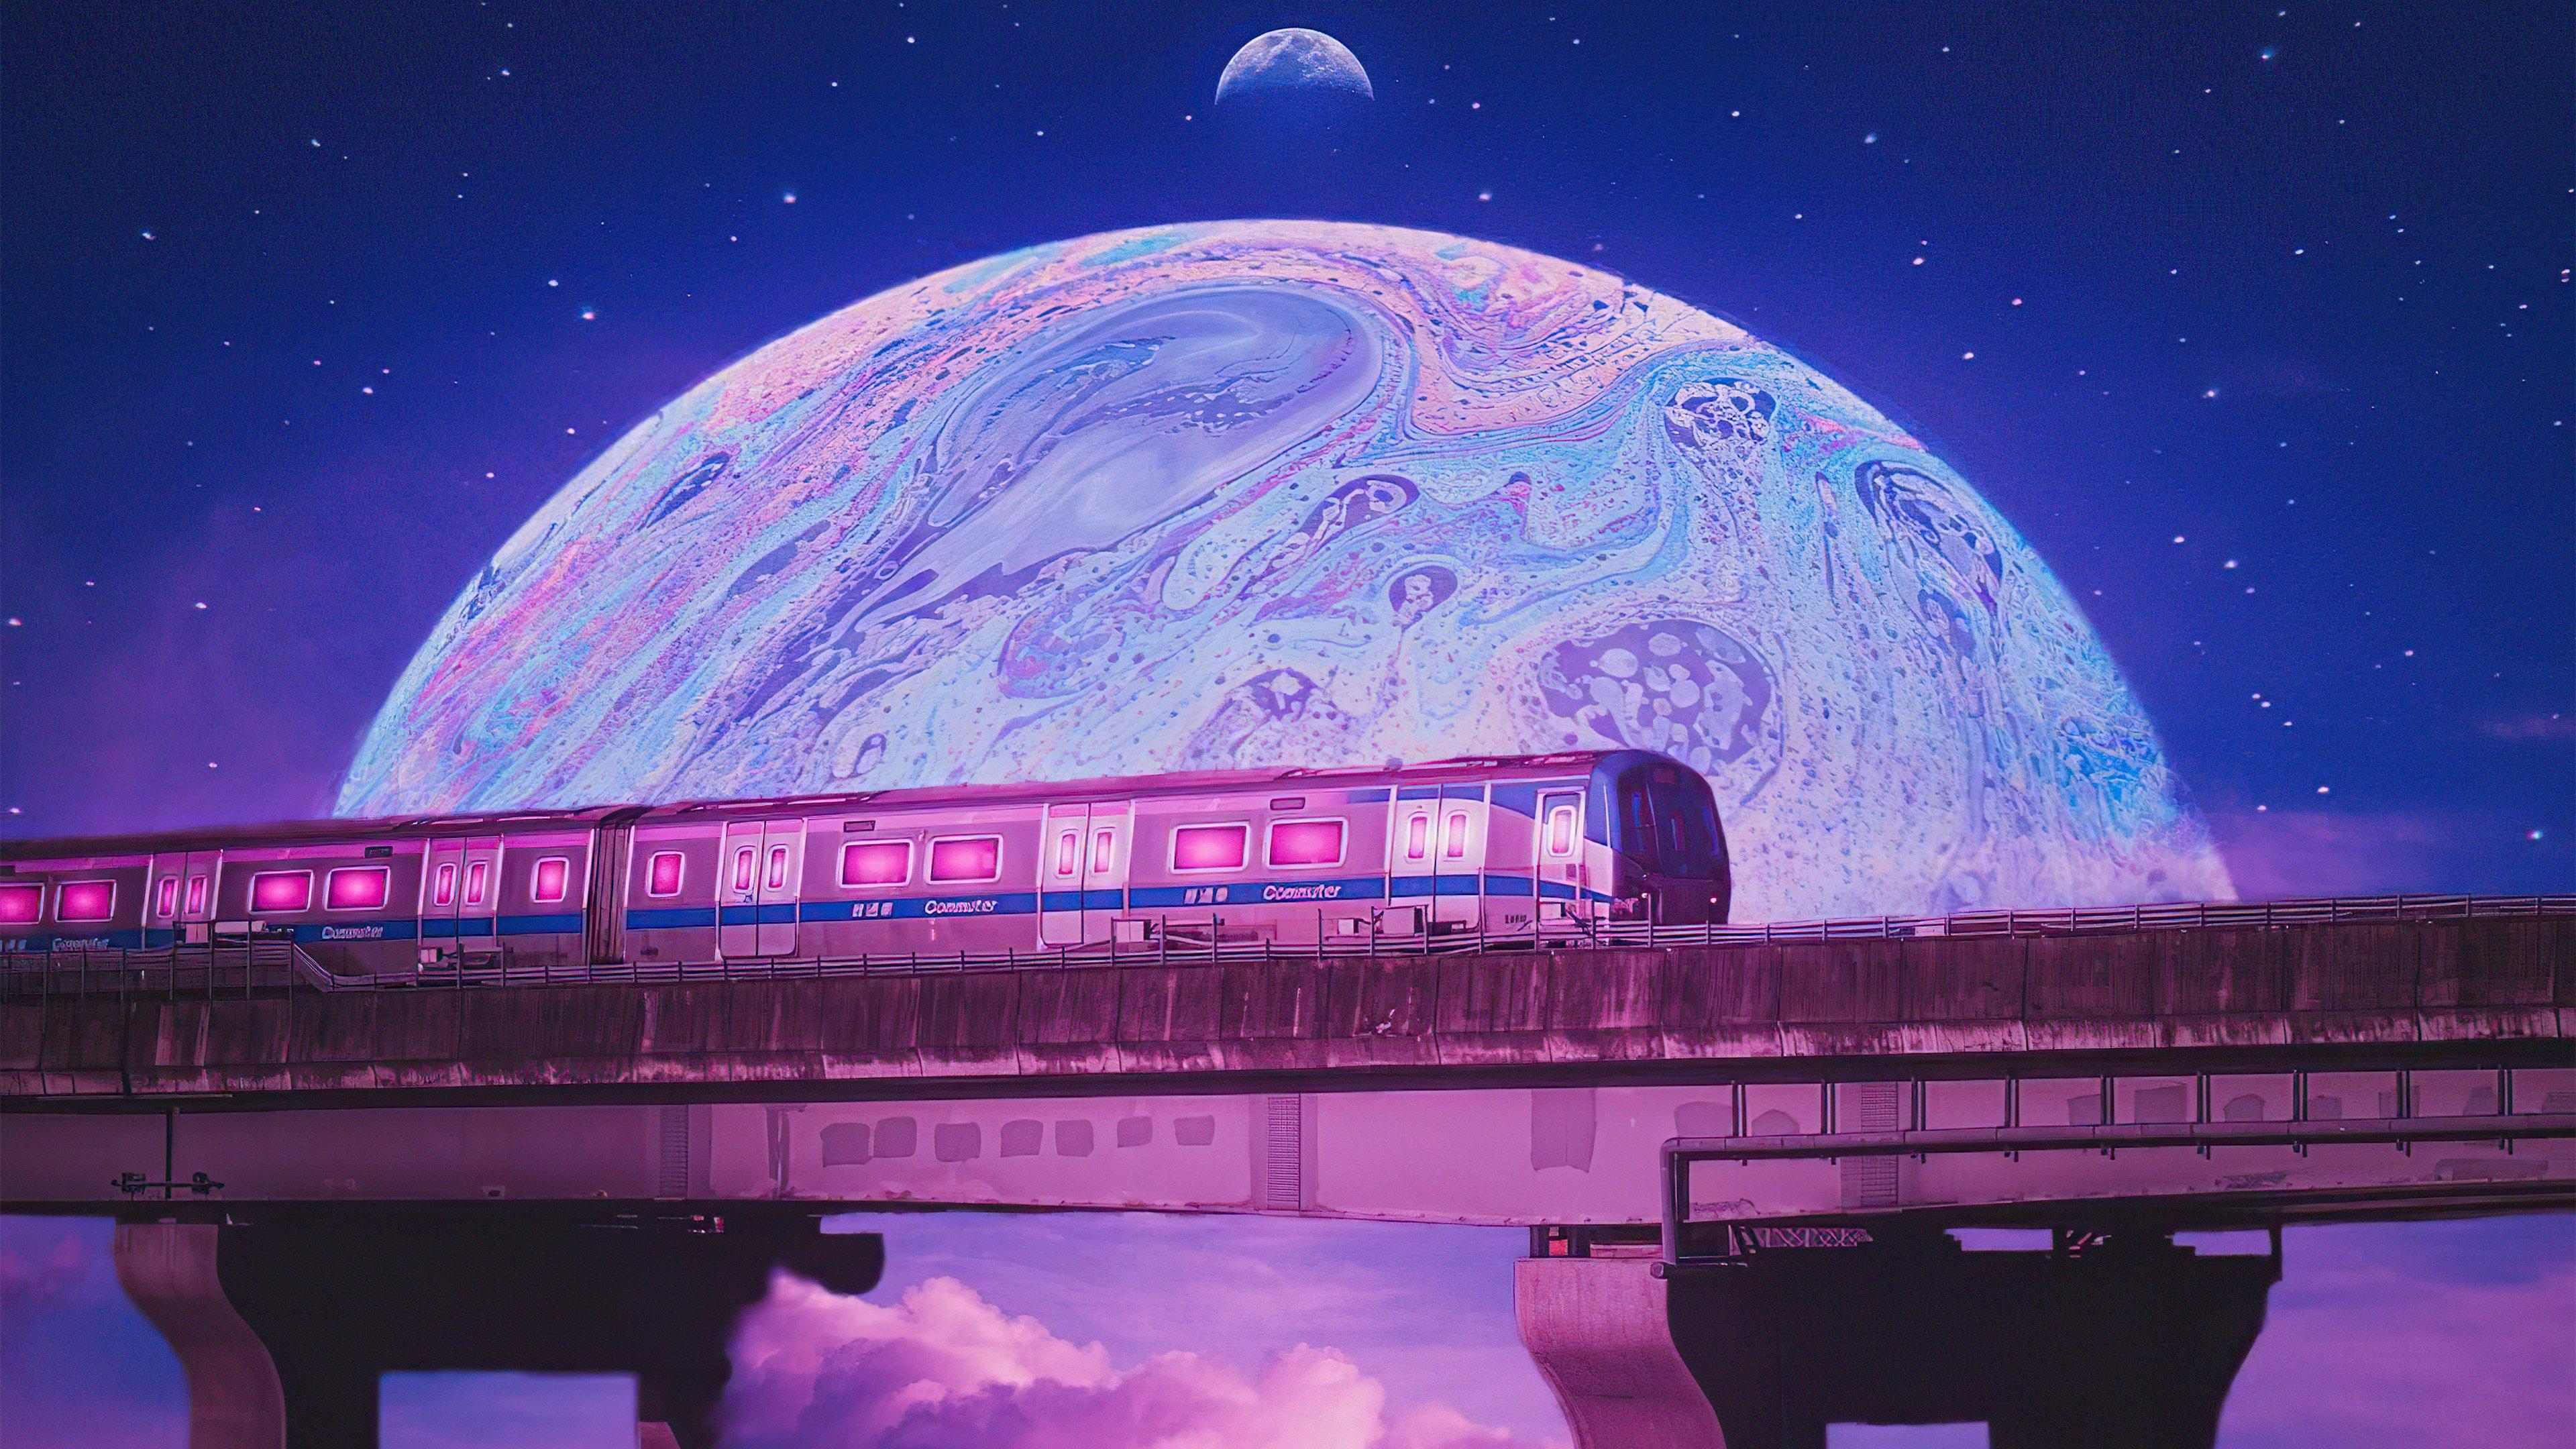 Wallpaper Train outside this planet